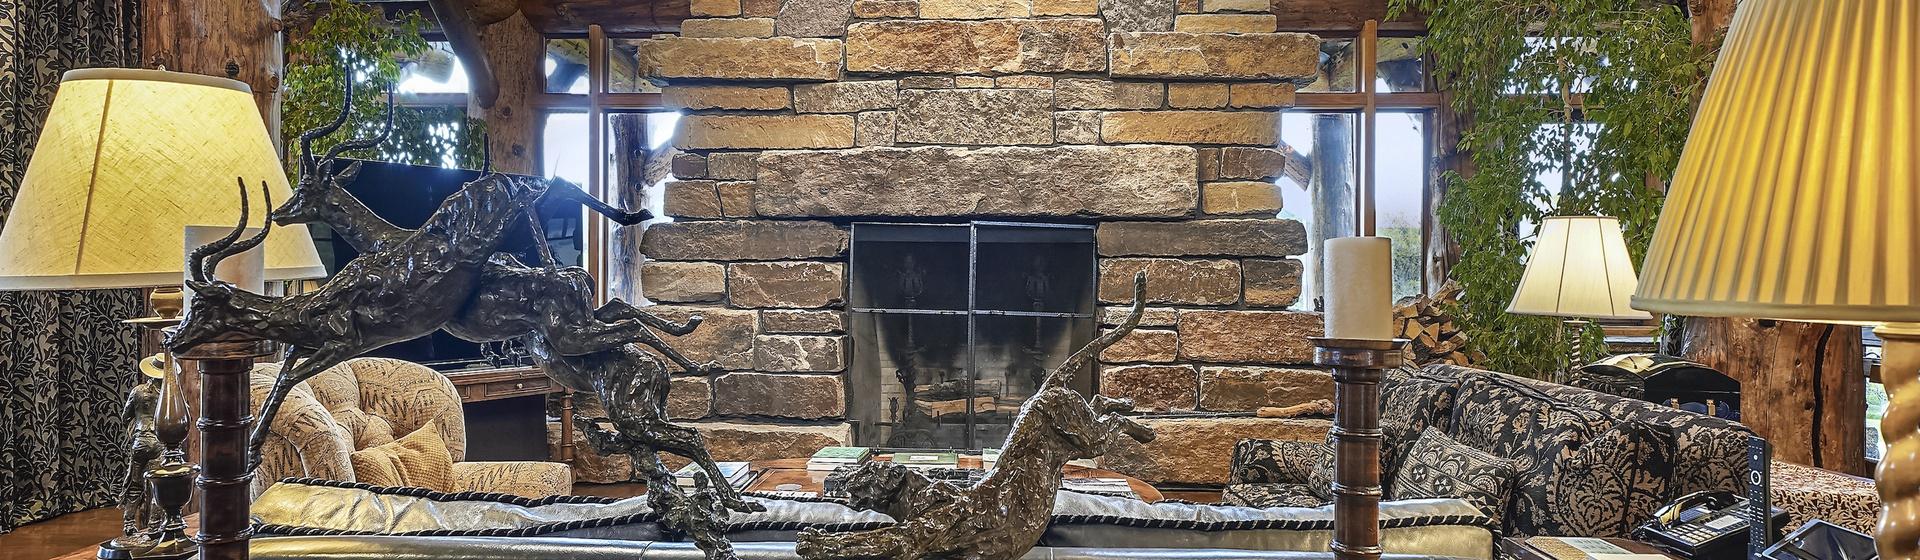 1.4-Telluride-Sleeping-Indian-Ranch-living-room-fireplace-3-web.JPG